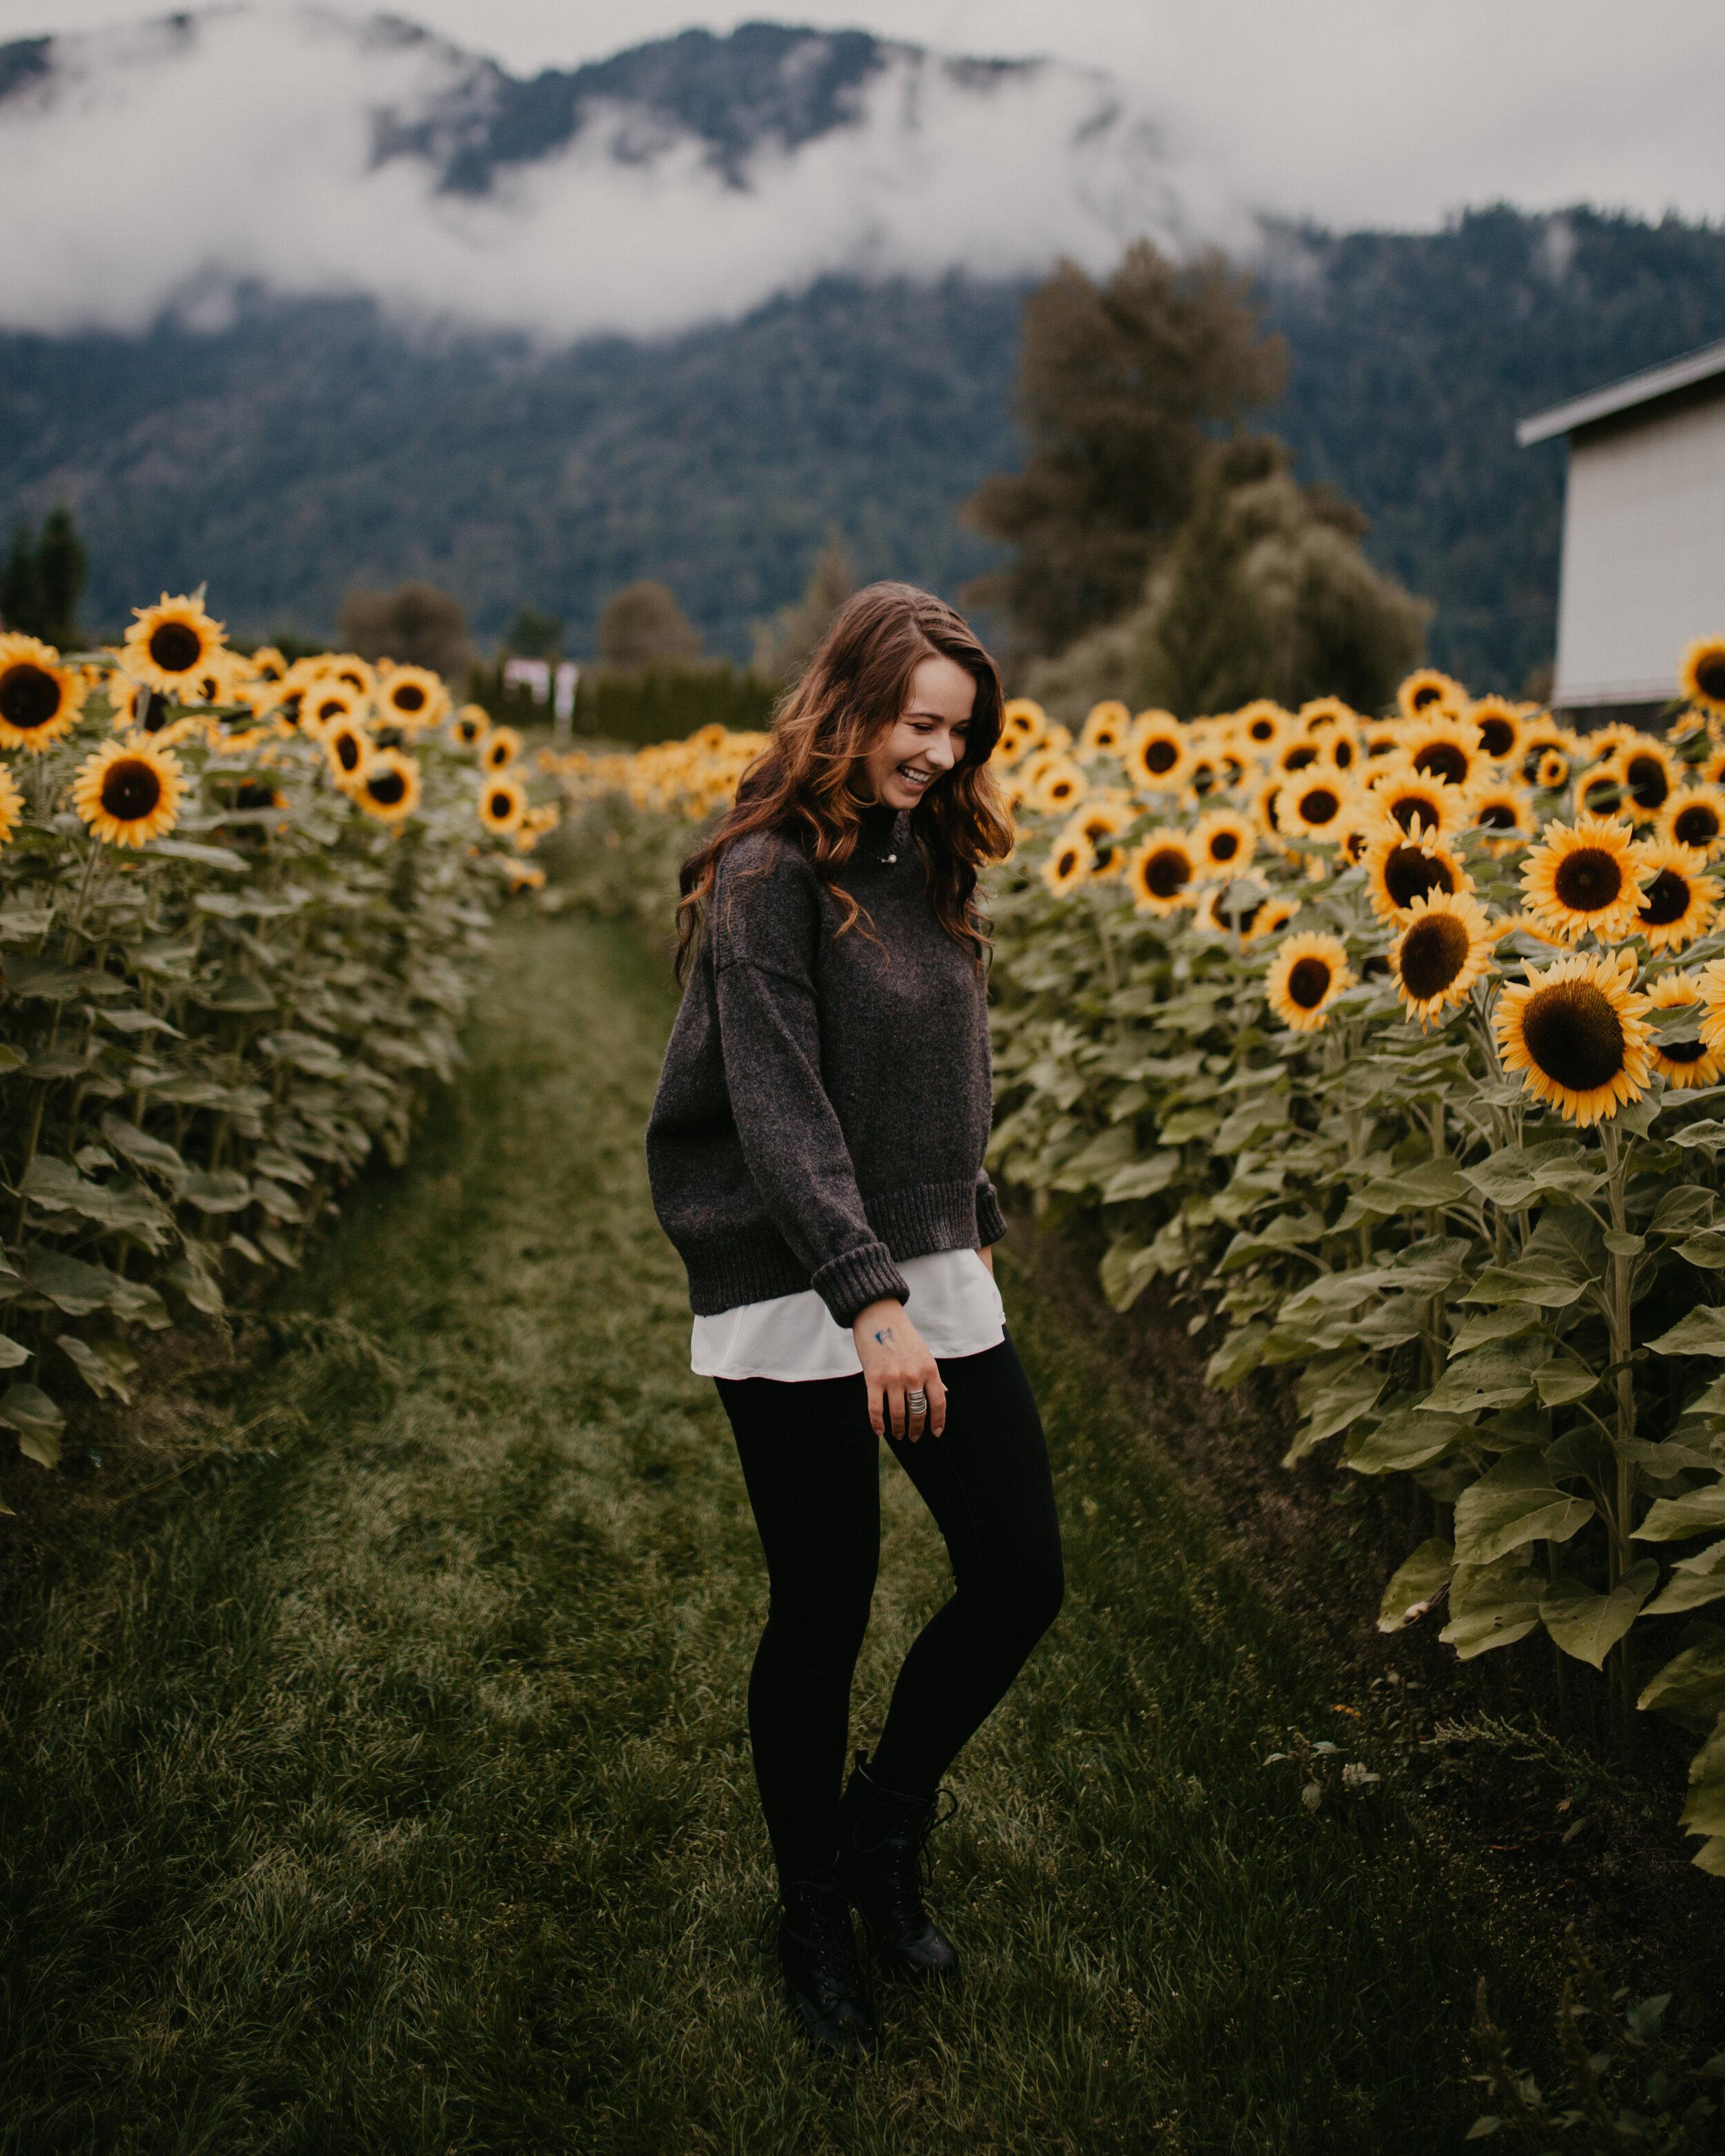 SunflowerFestival-12.jpg